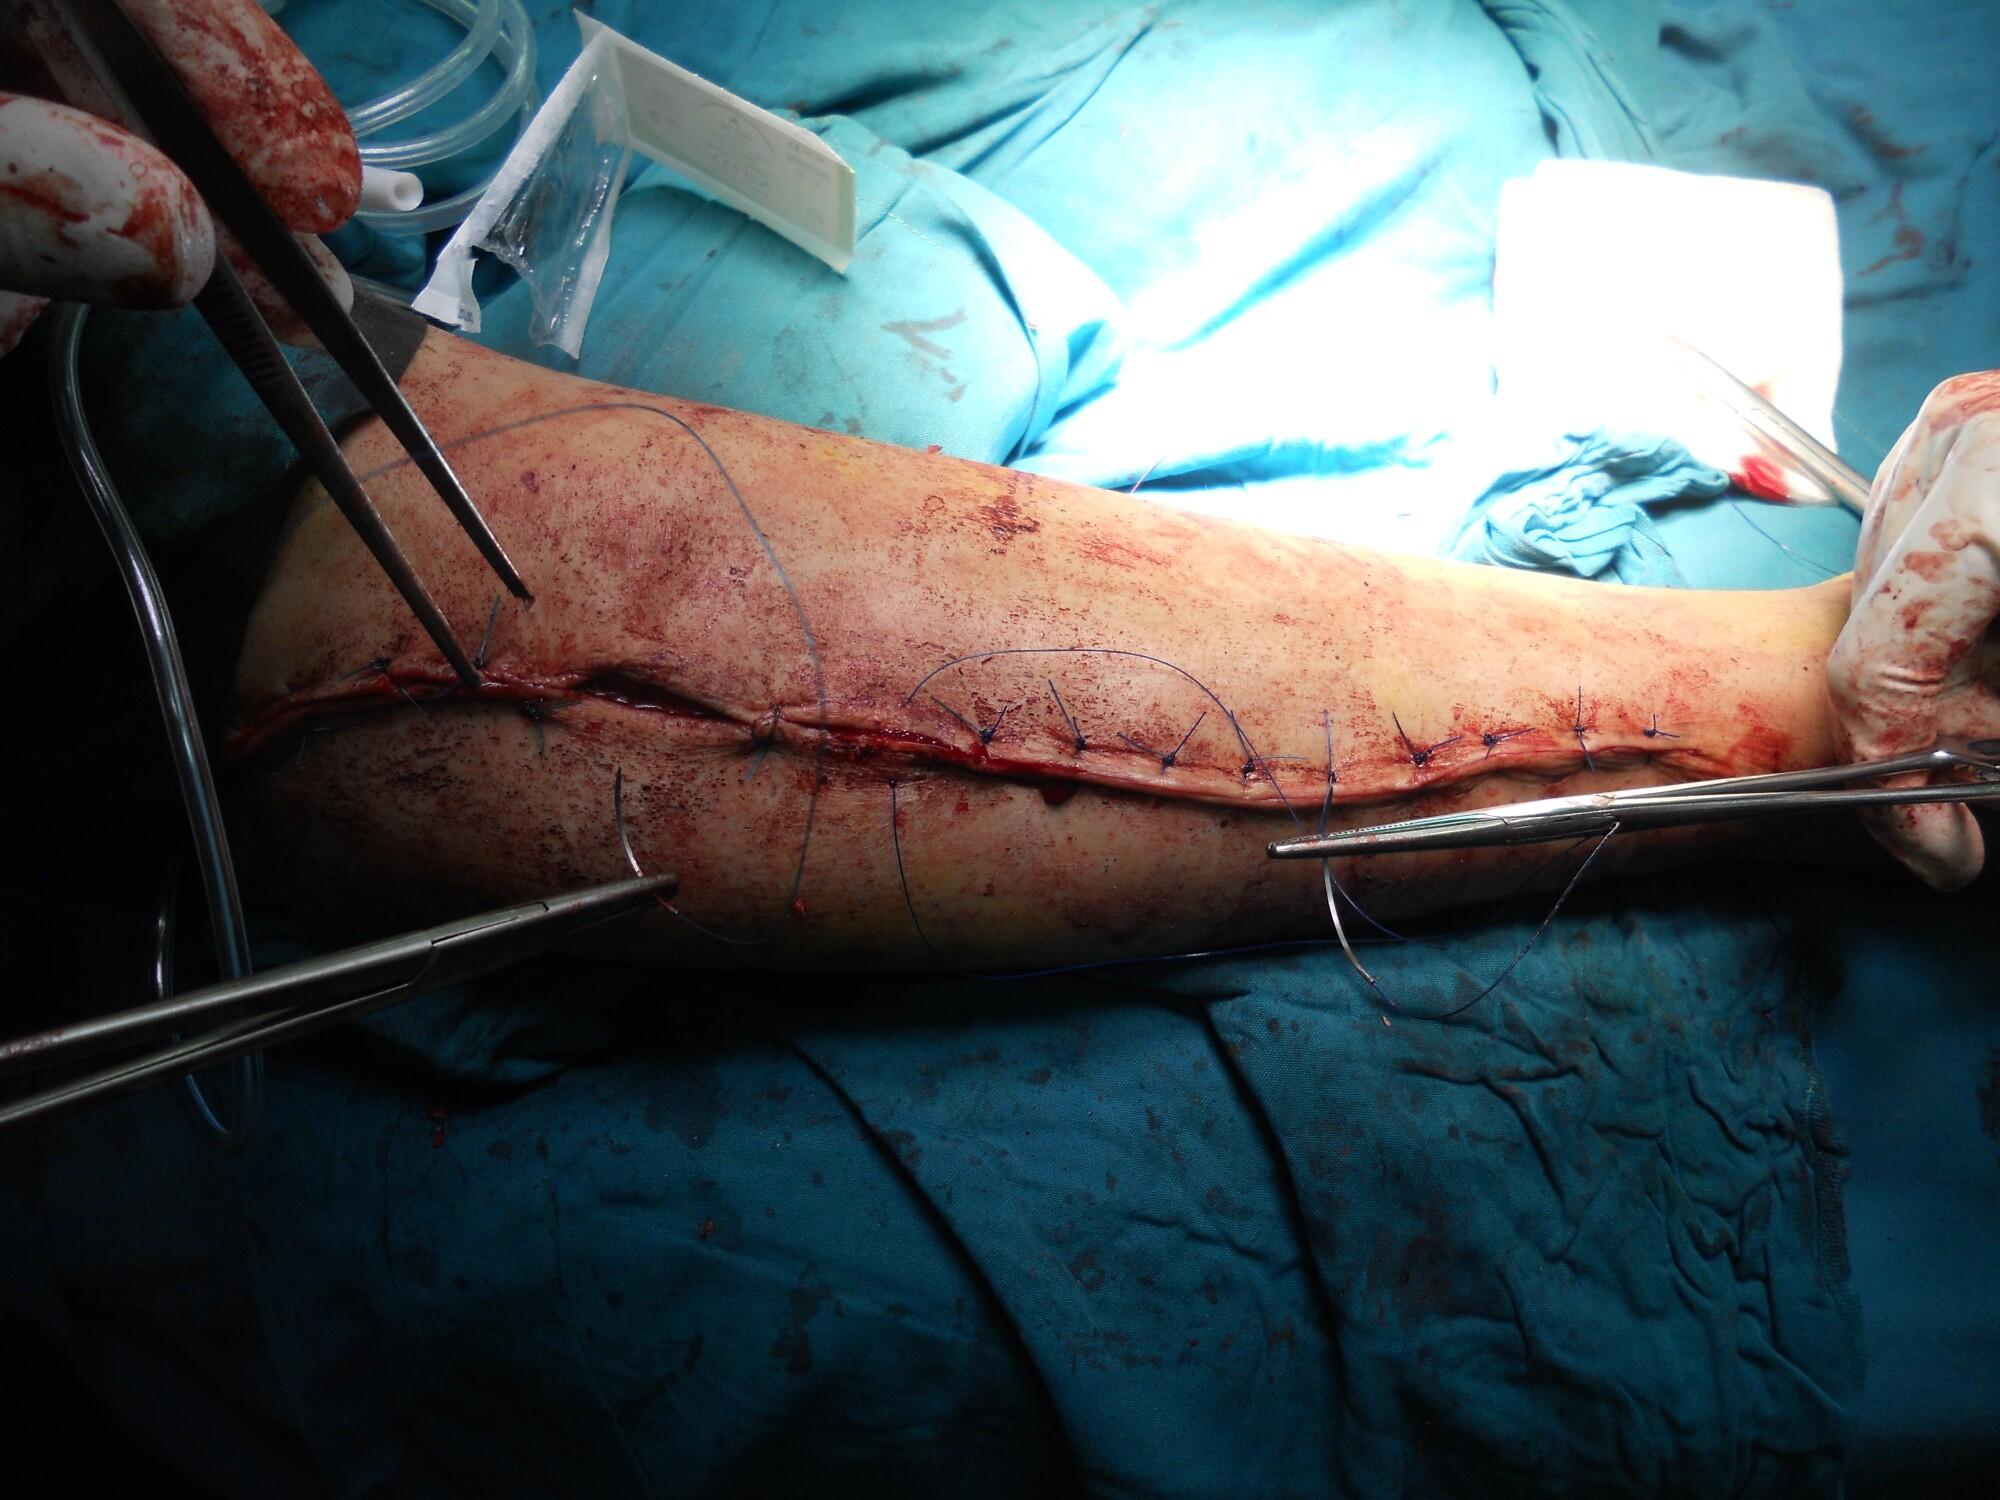 Top 5 Factors to Consider When Choosing Orthopedic Surgeons